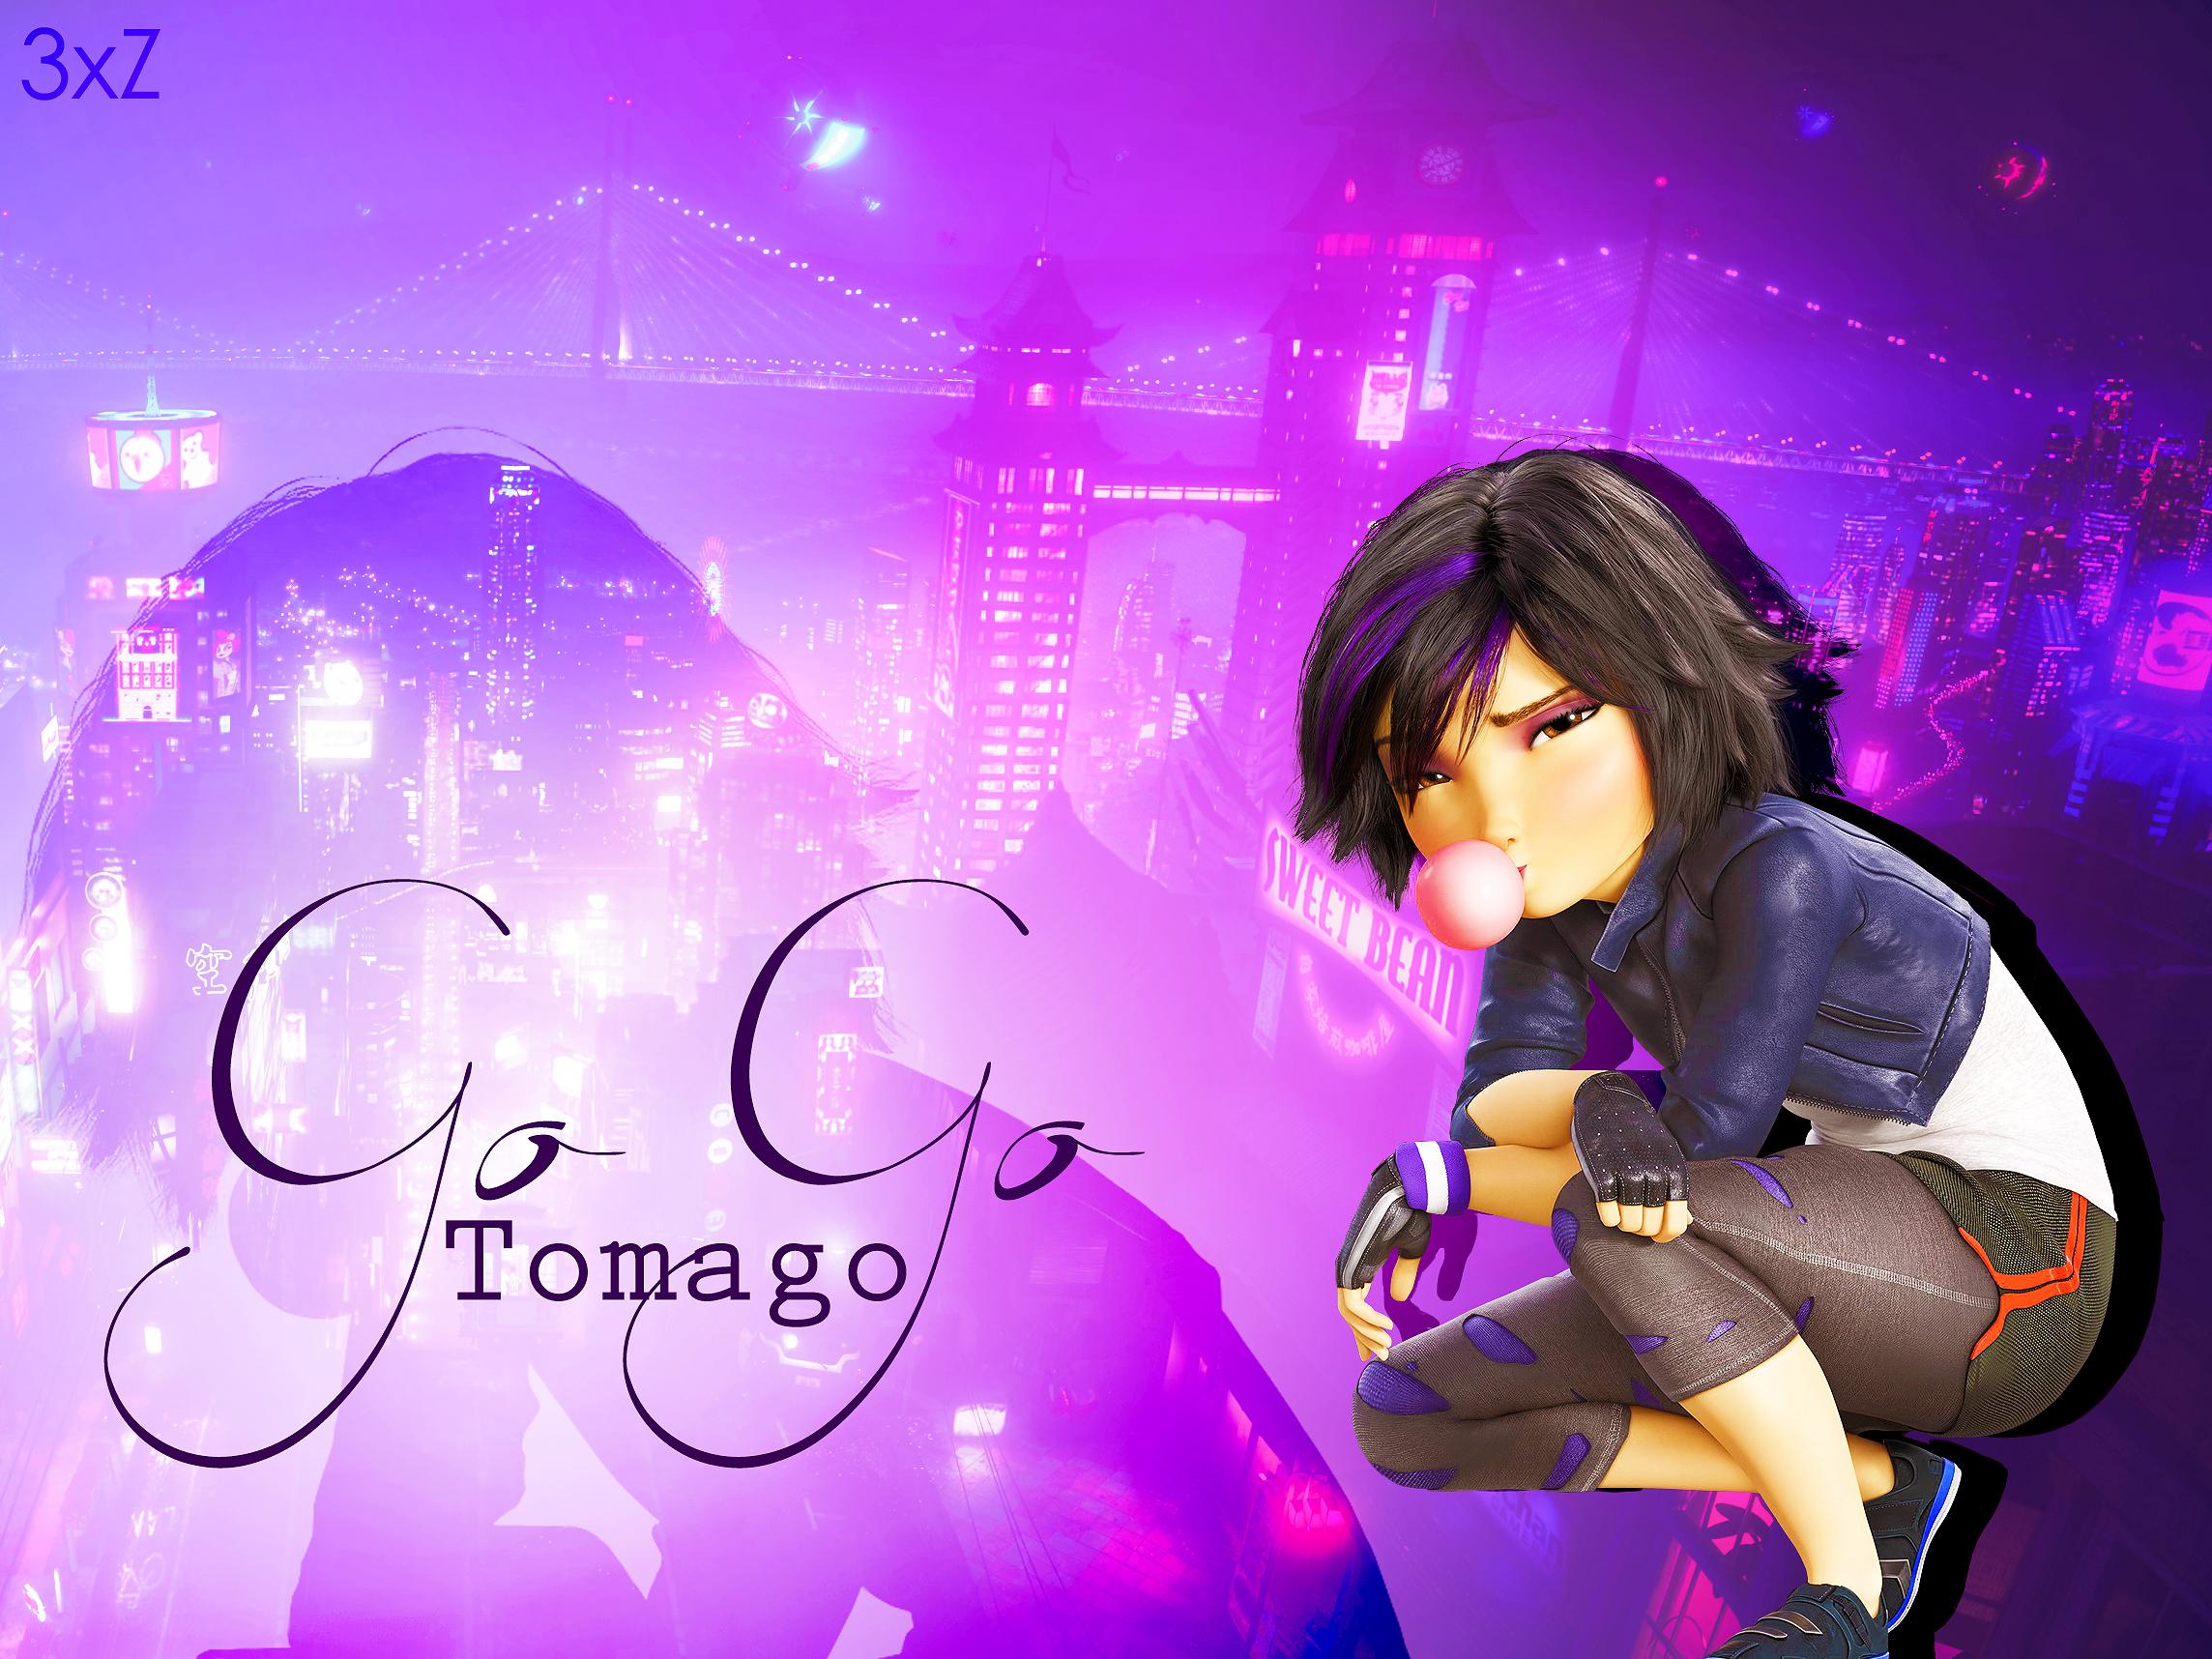 Hd Disney Big Hero 6 G...